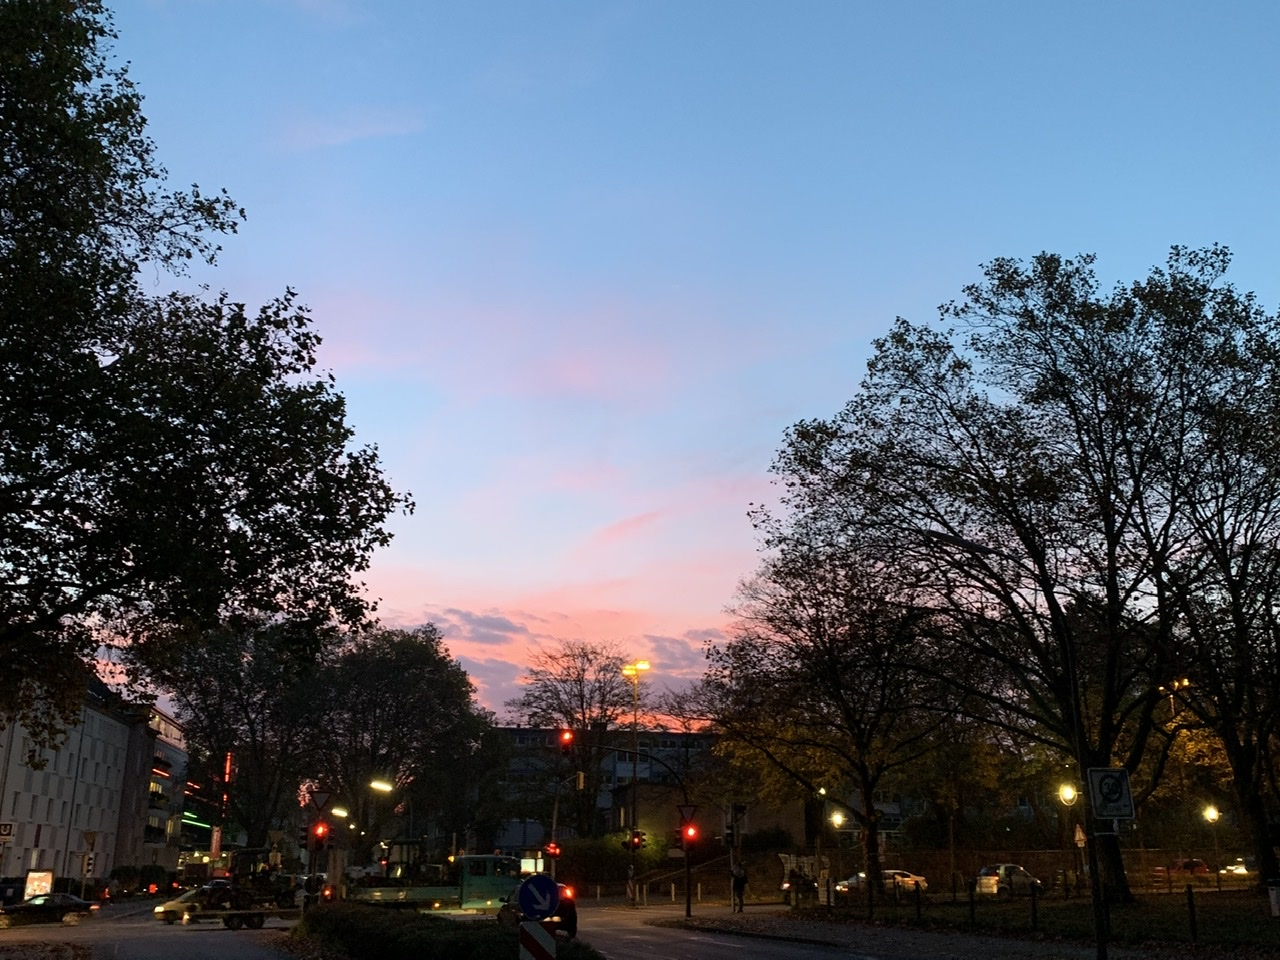 Sonnenaufgang in Dortmund